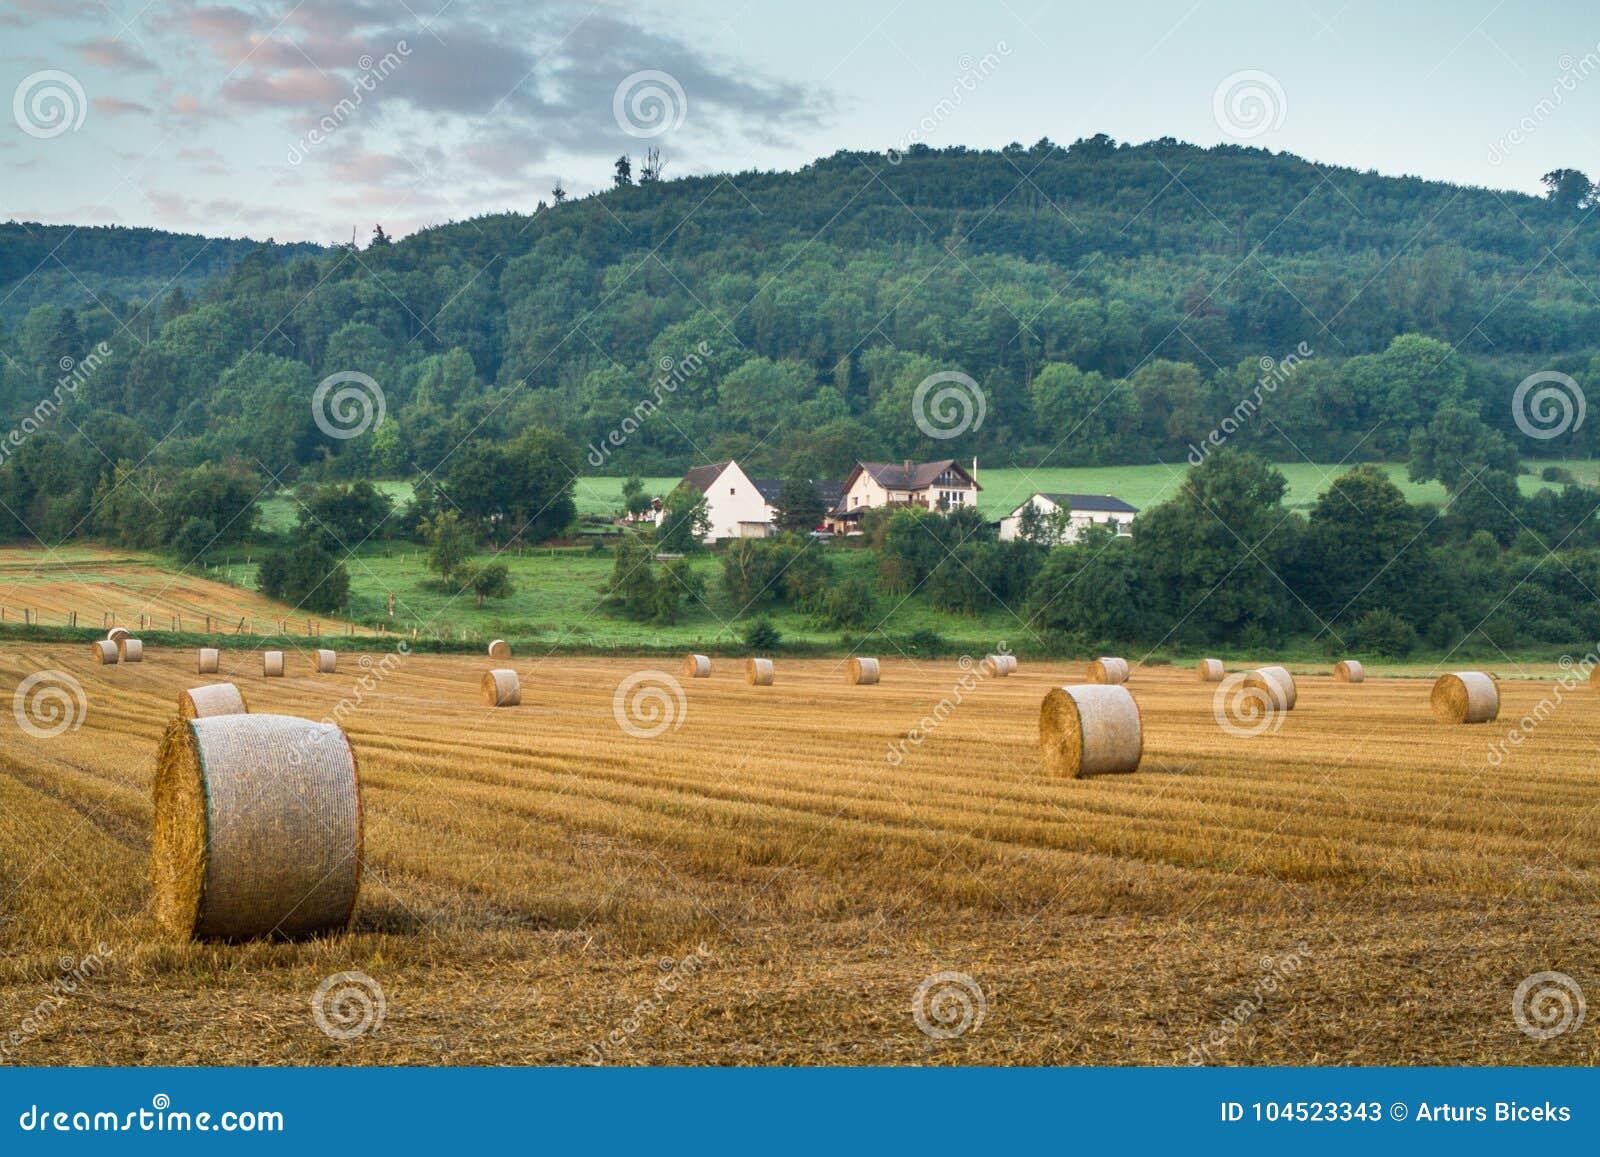 Hay Rolls Stock Image Image Of Background Moss Macro